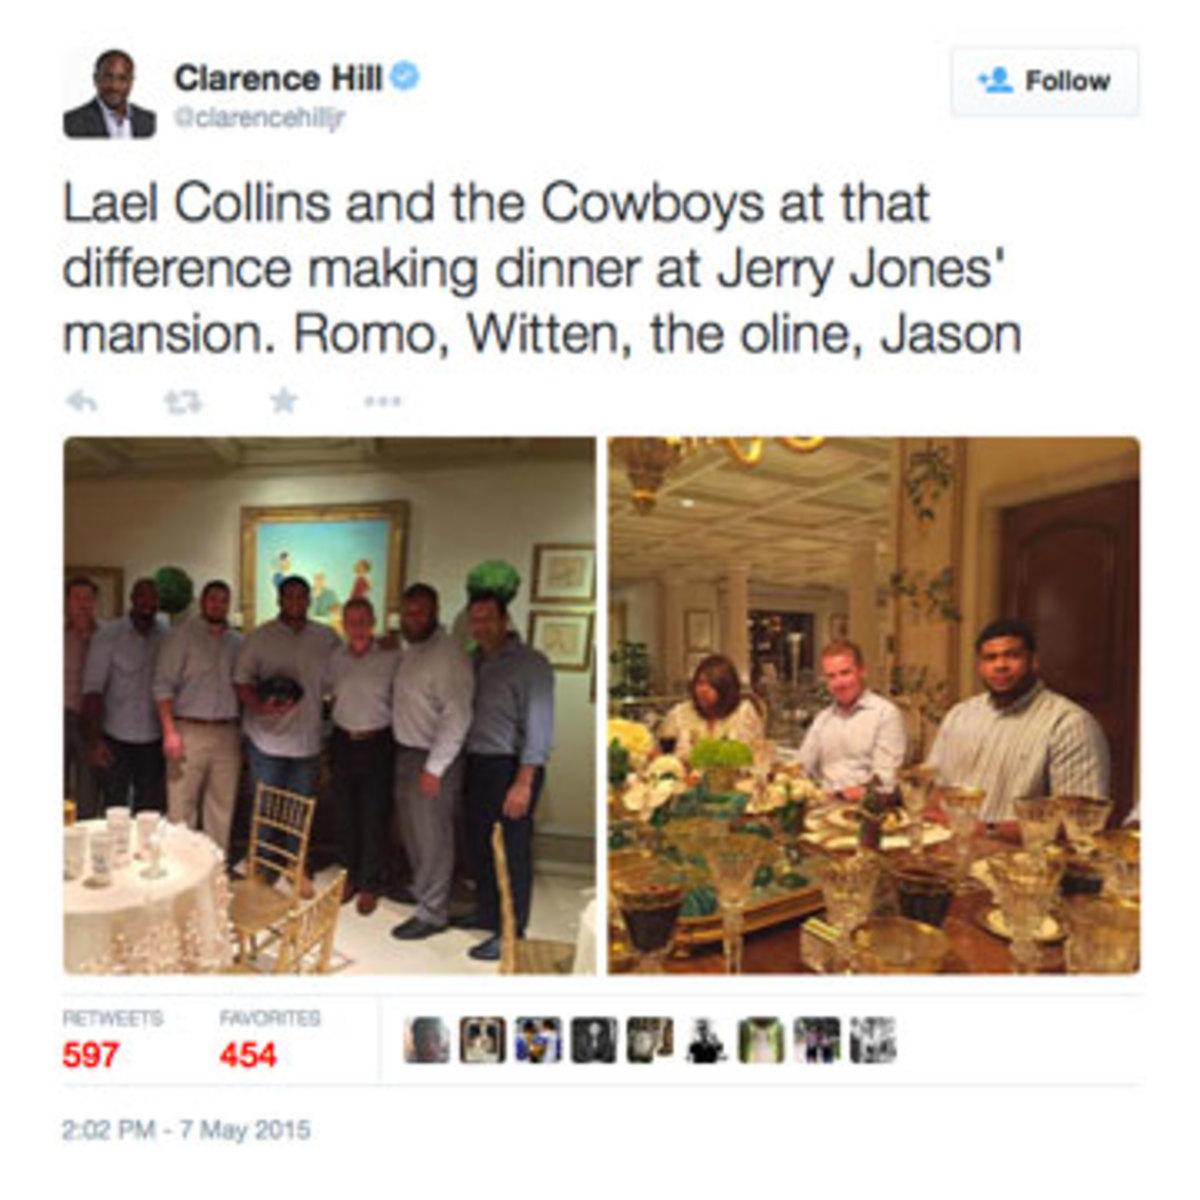 collins-cowboys-dinner-360